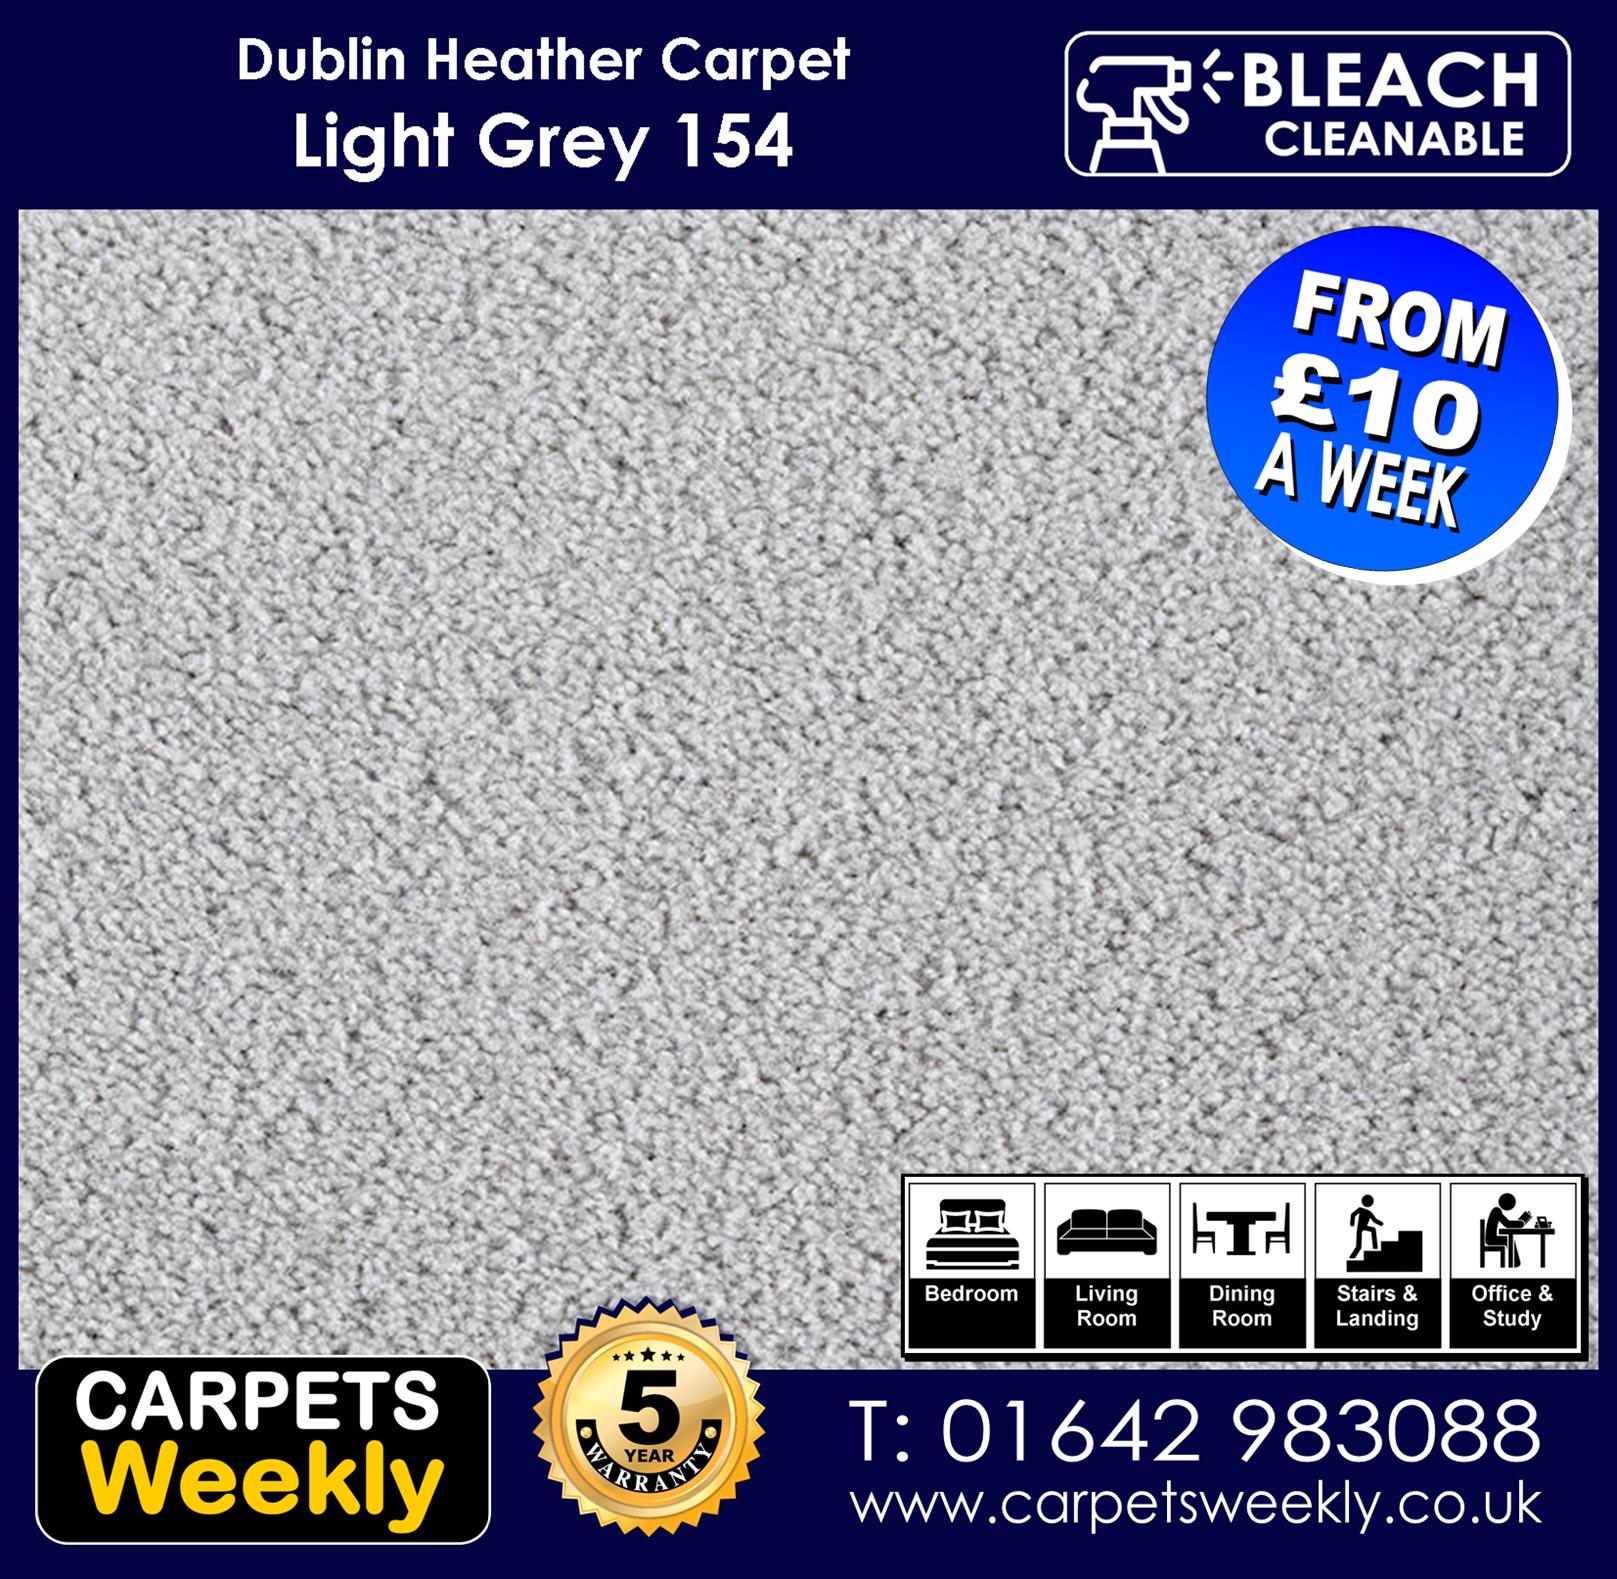 Carpets Weekly Dublin Heather Light grey - 154 mid range carpet